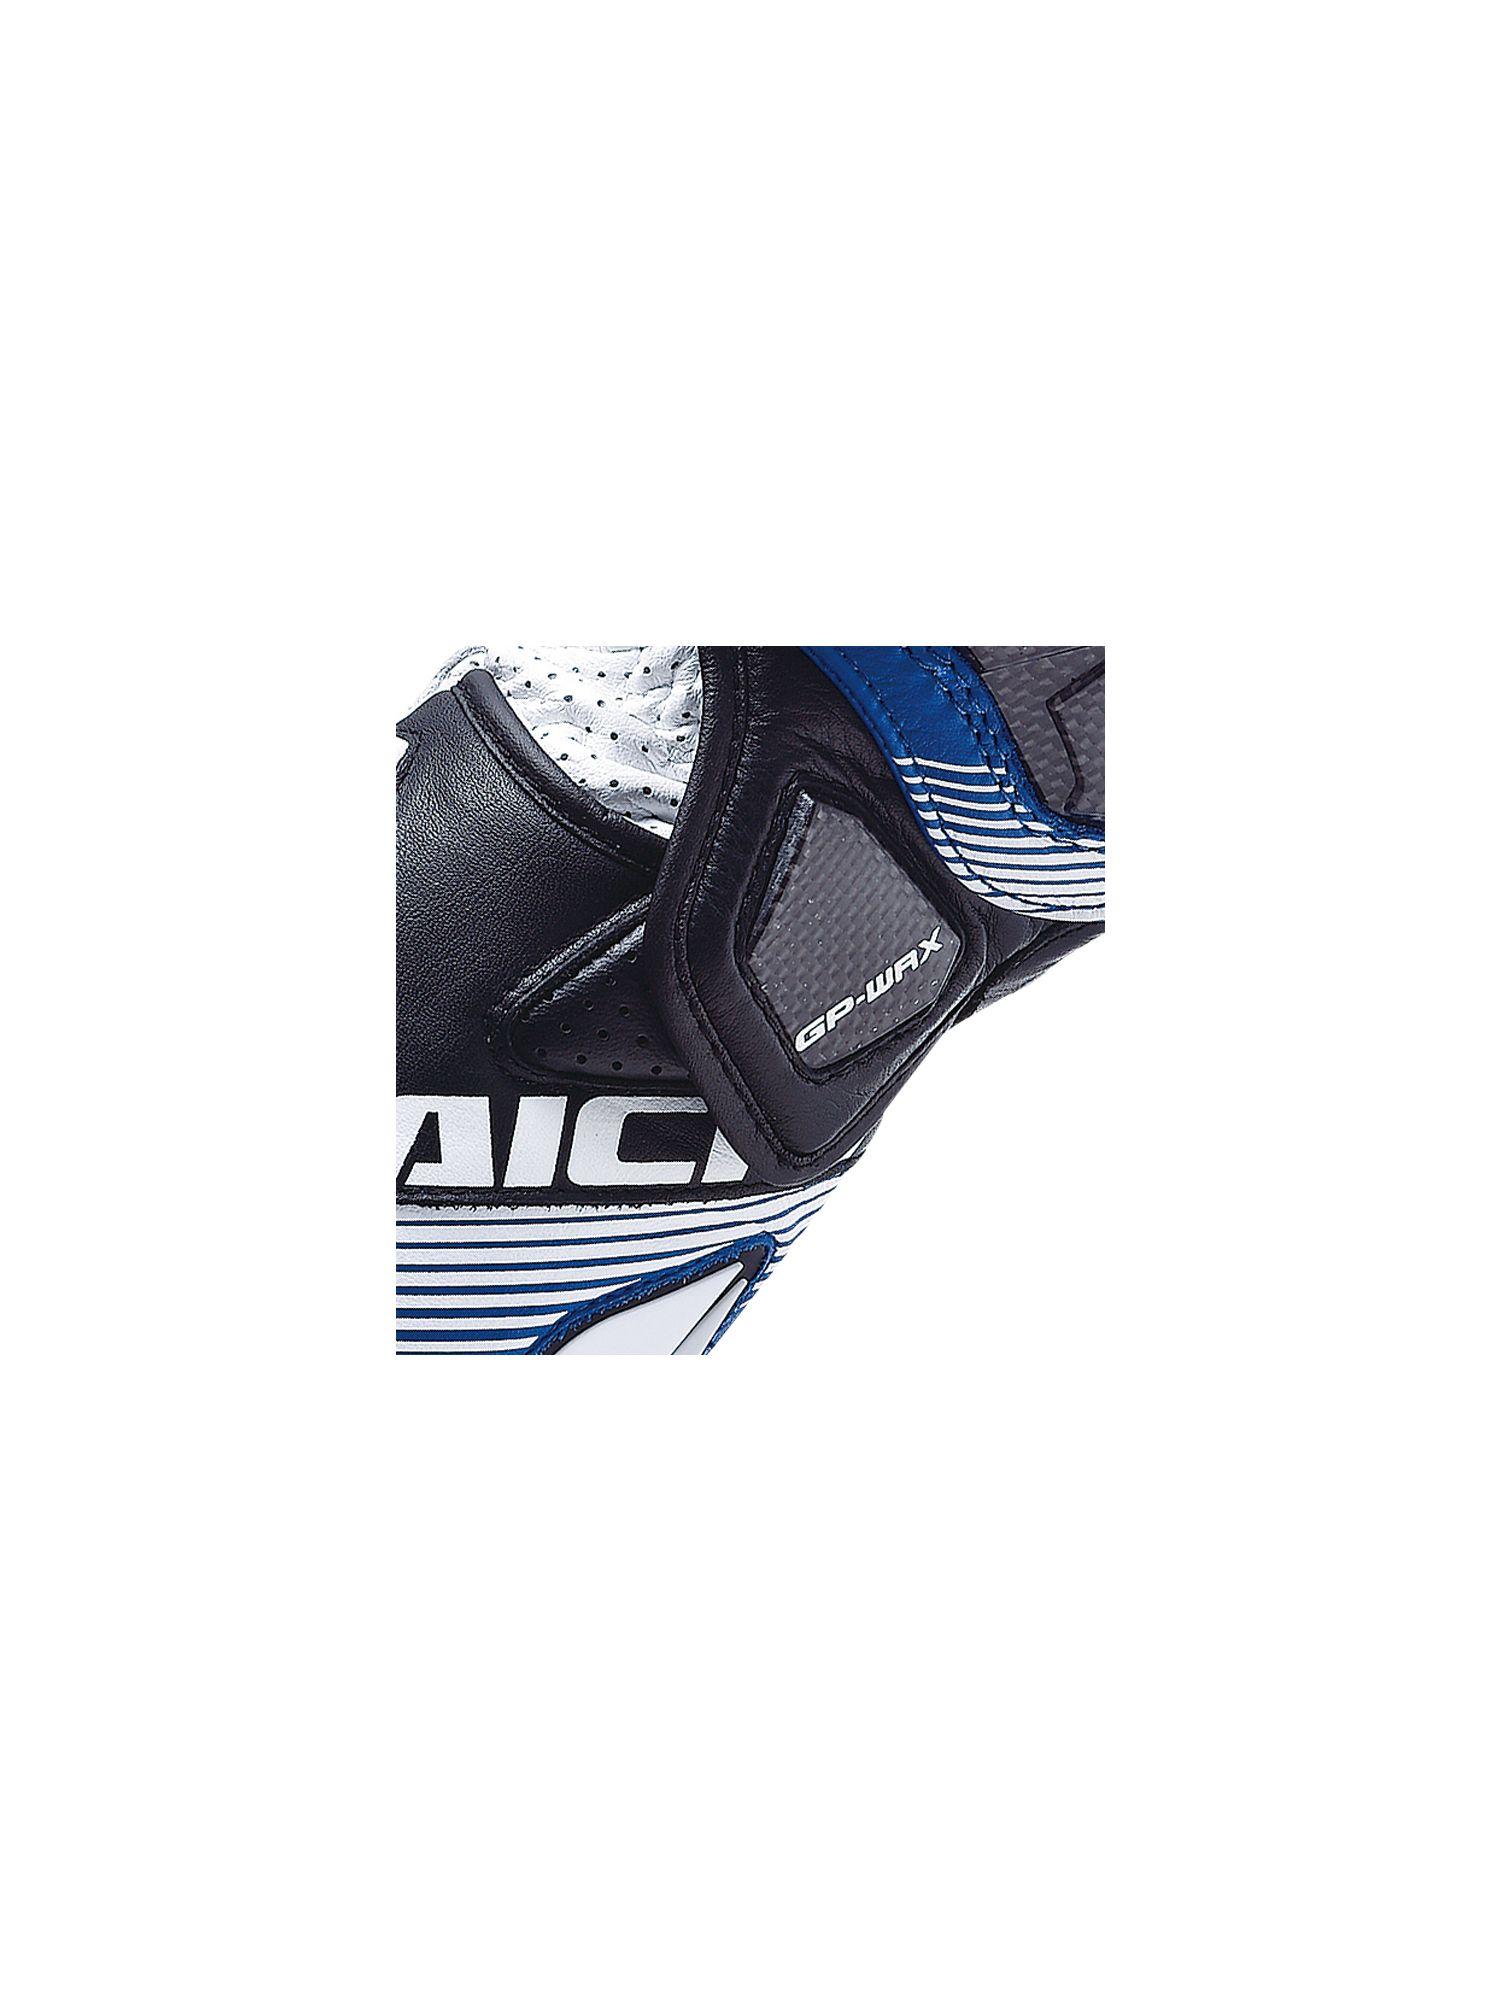 NXT052   GP-WRX RACING GLOVE[5colors]